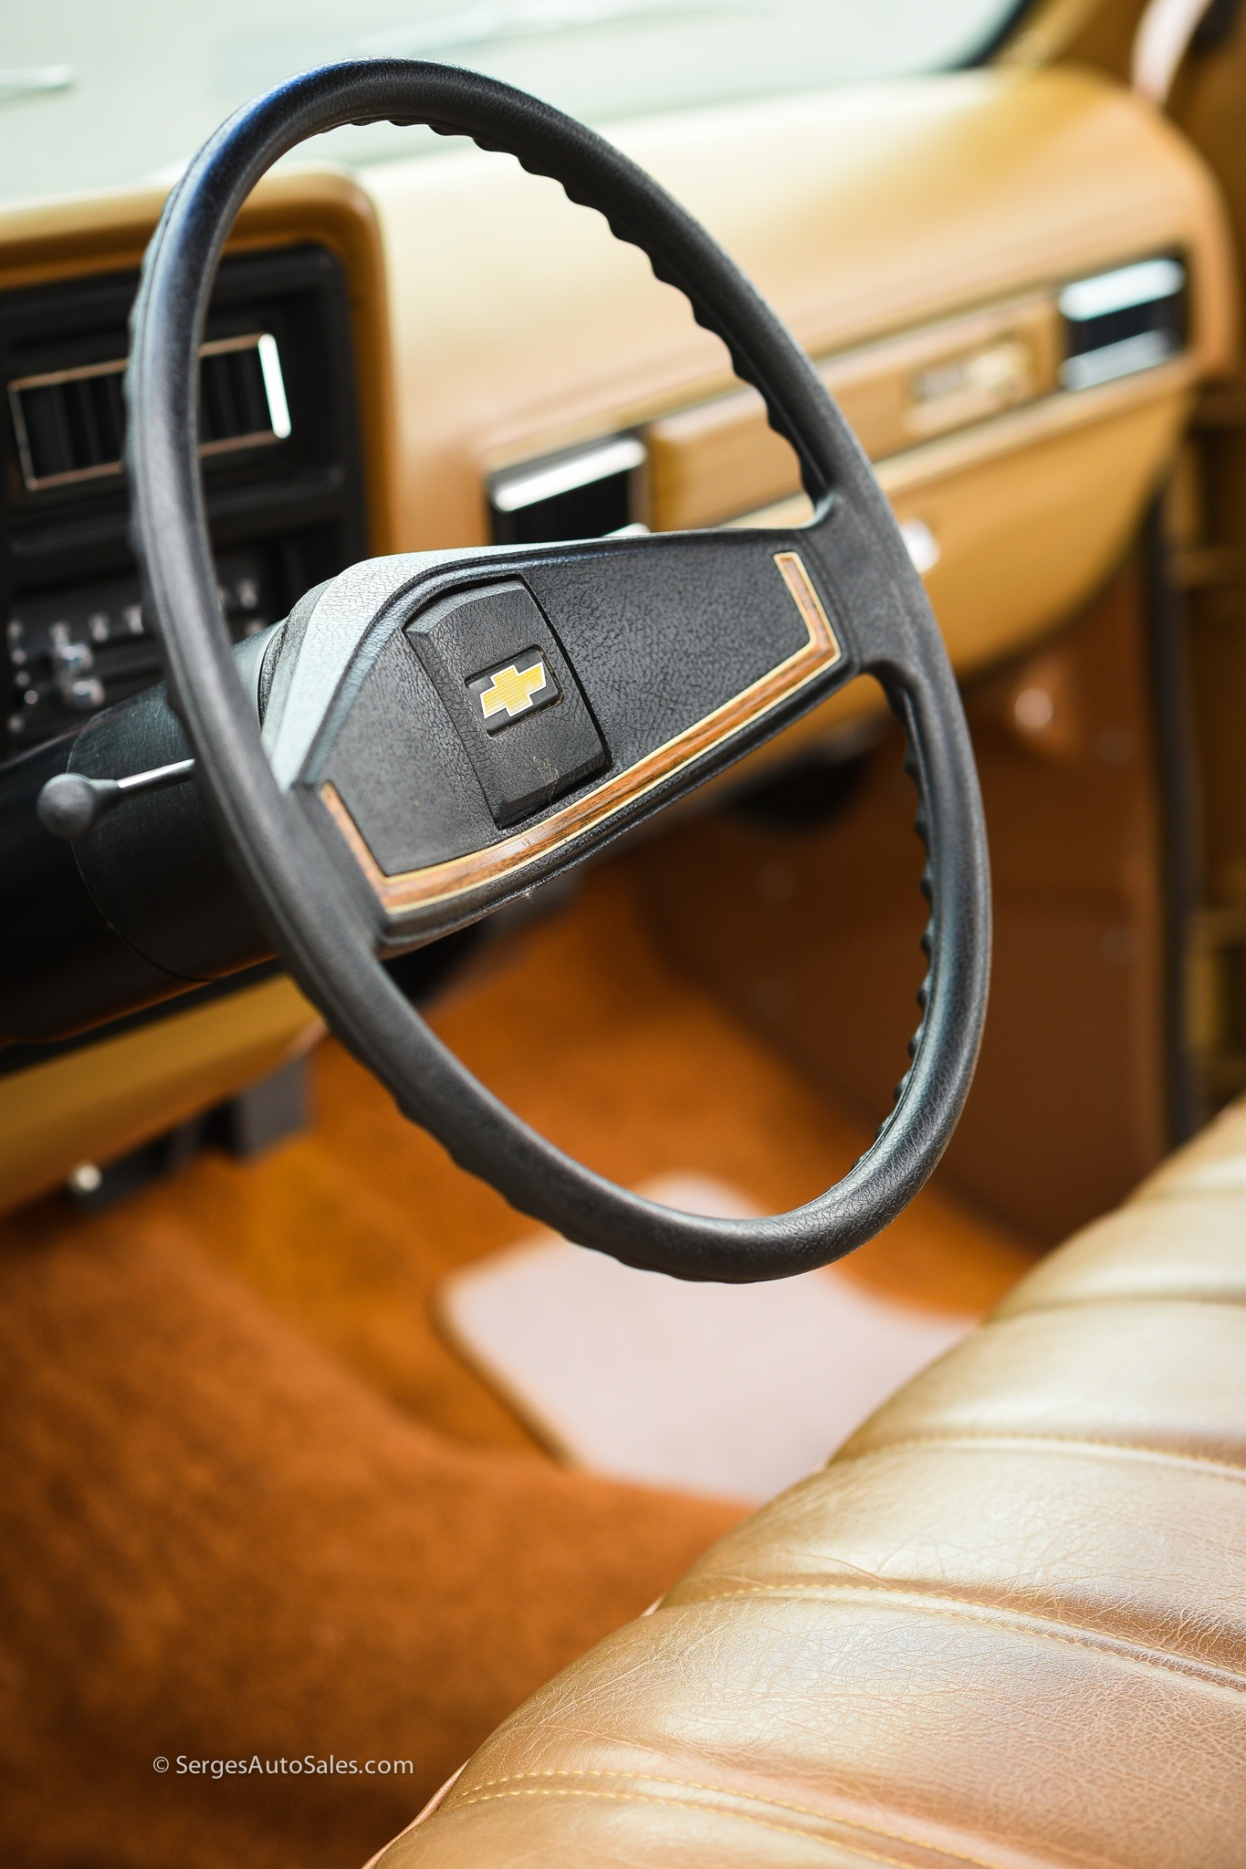 1973-1972-1971-1970-1969-chevrolet-cheyenne-pick-up-for-sale-barrett-mecum-serges-auto-sales-scranton-blakely-pennsylvania-57